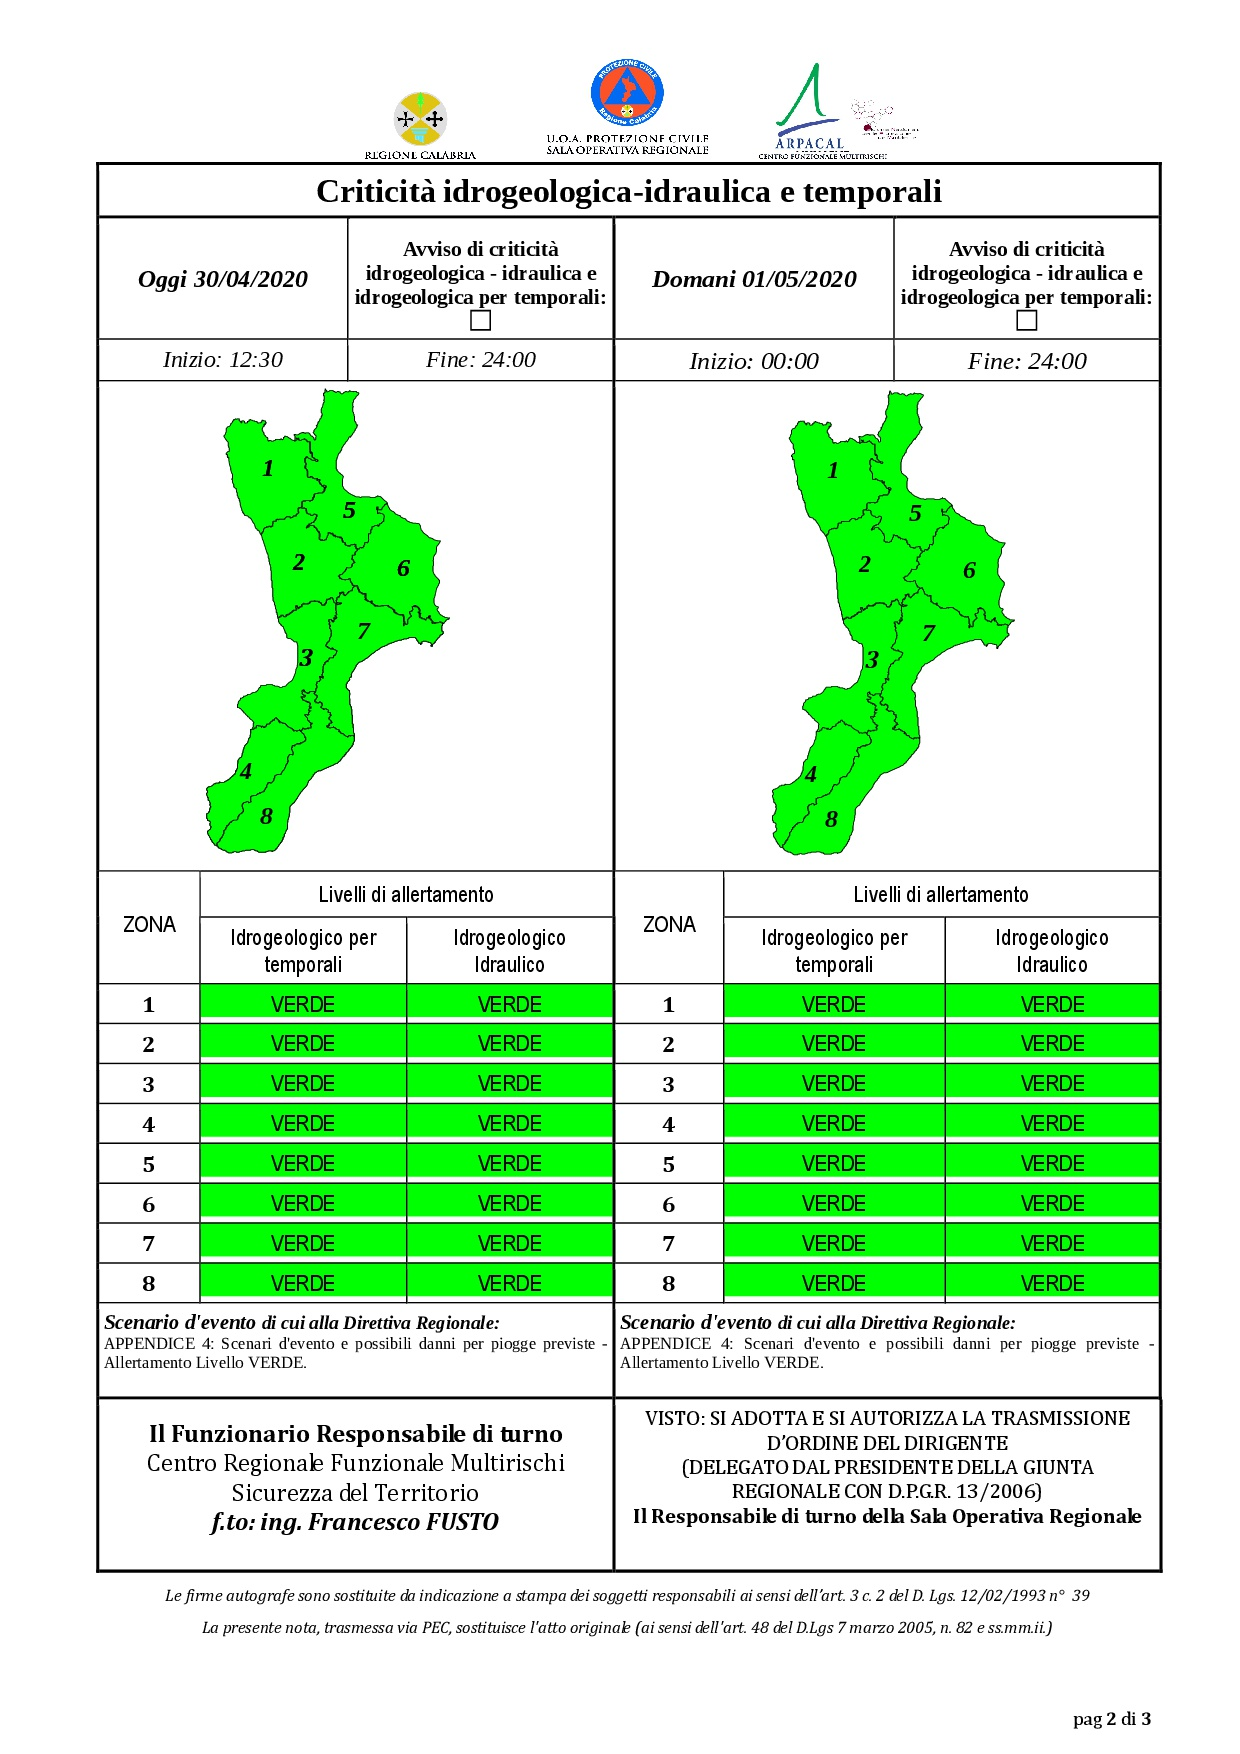 Criticità idrogeologica-idraulica e temporali in Calabria 30-04-2020